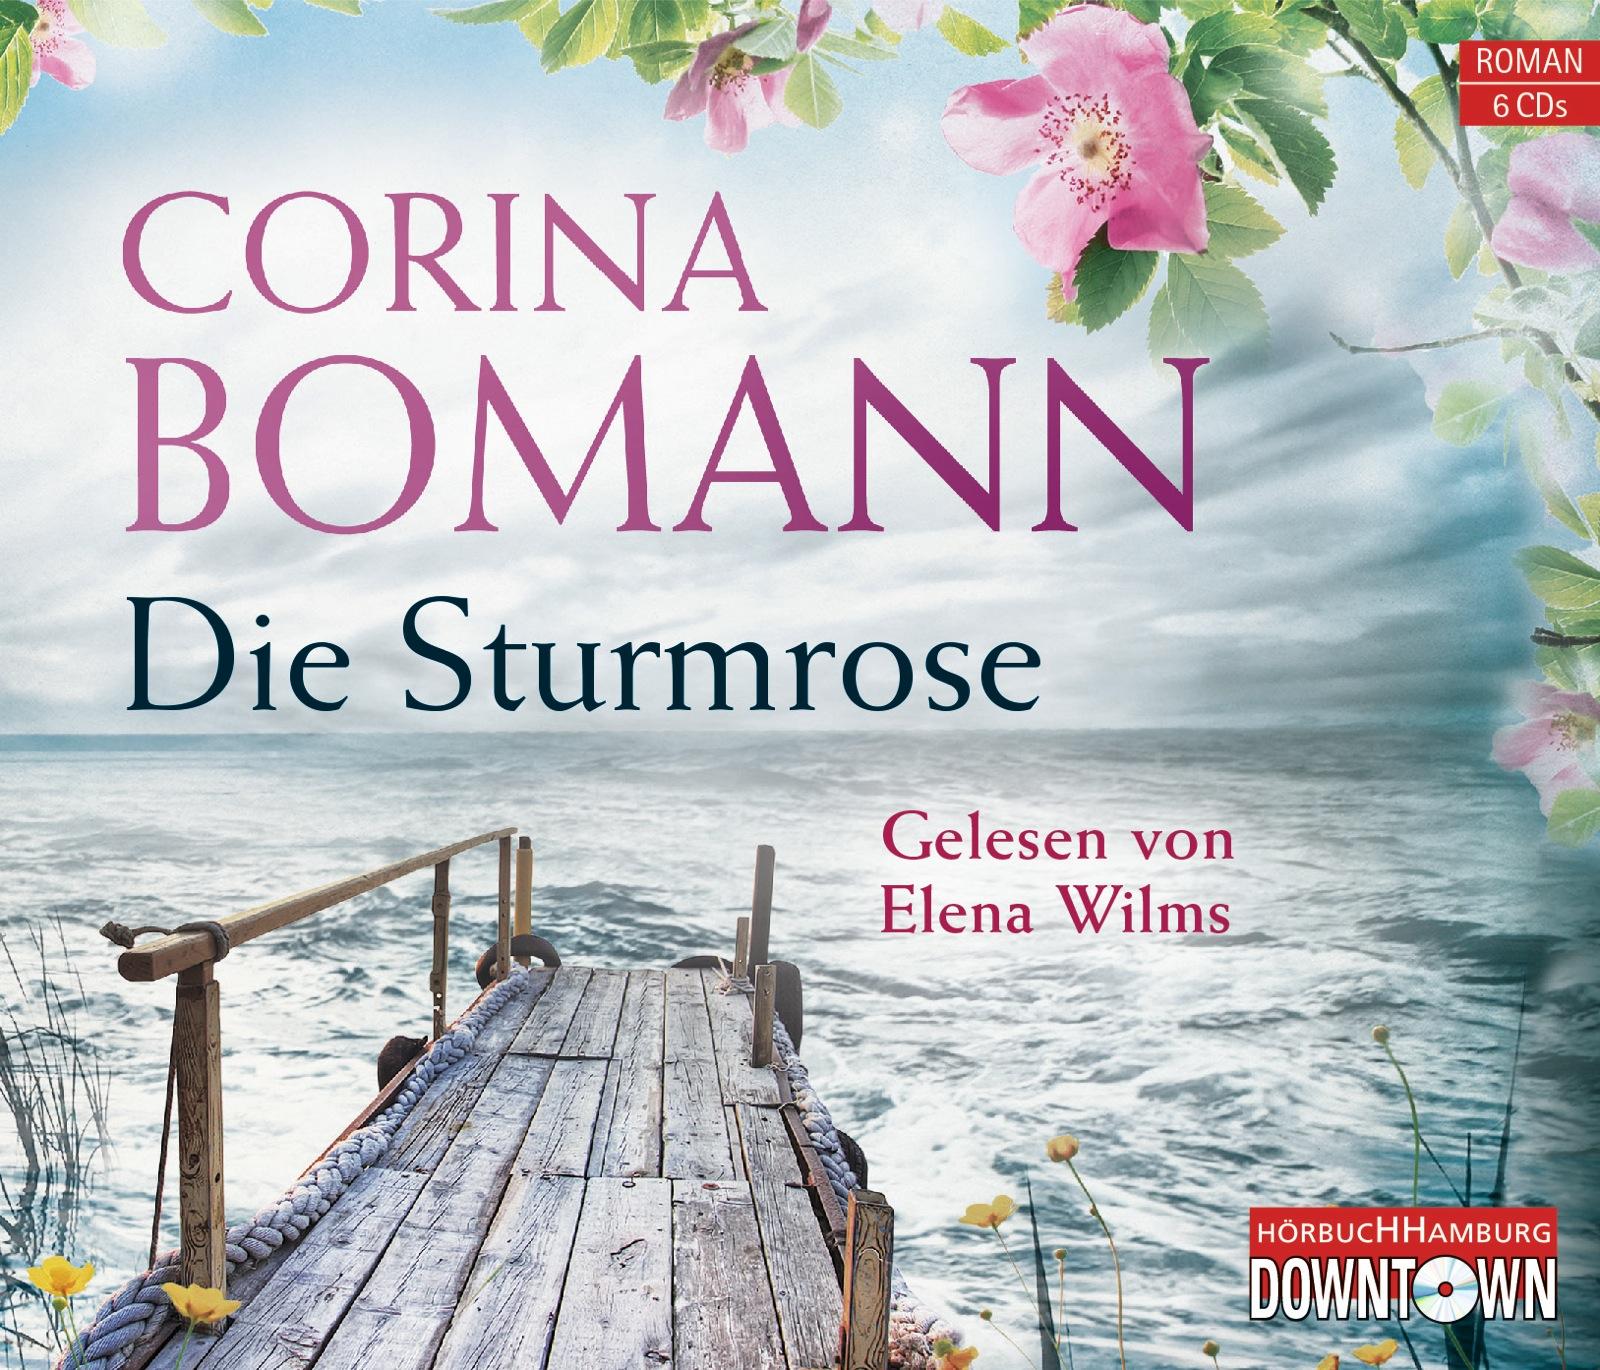 Die Sturmrose - Corina Bomann [6 Audio CDs]